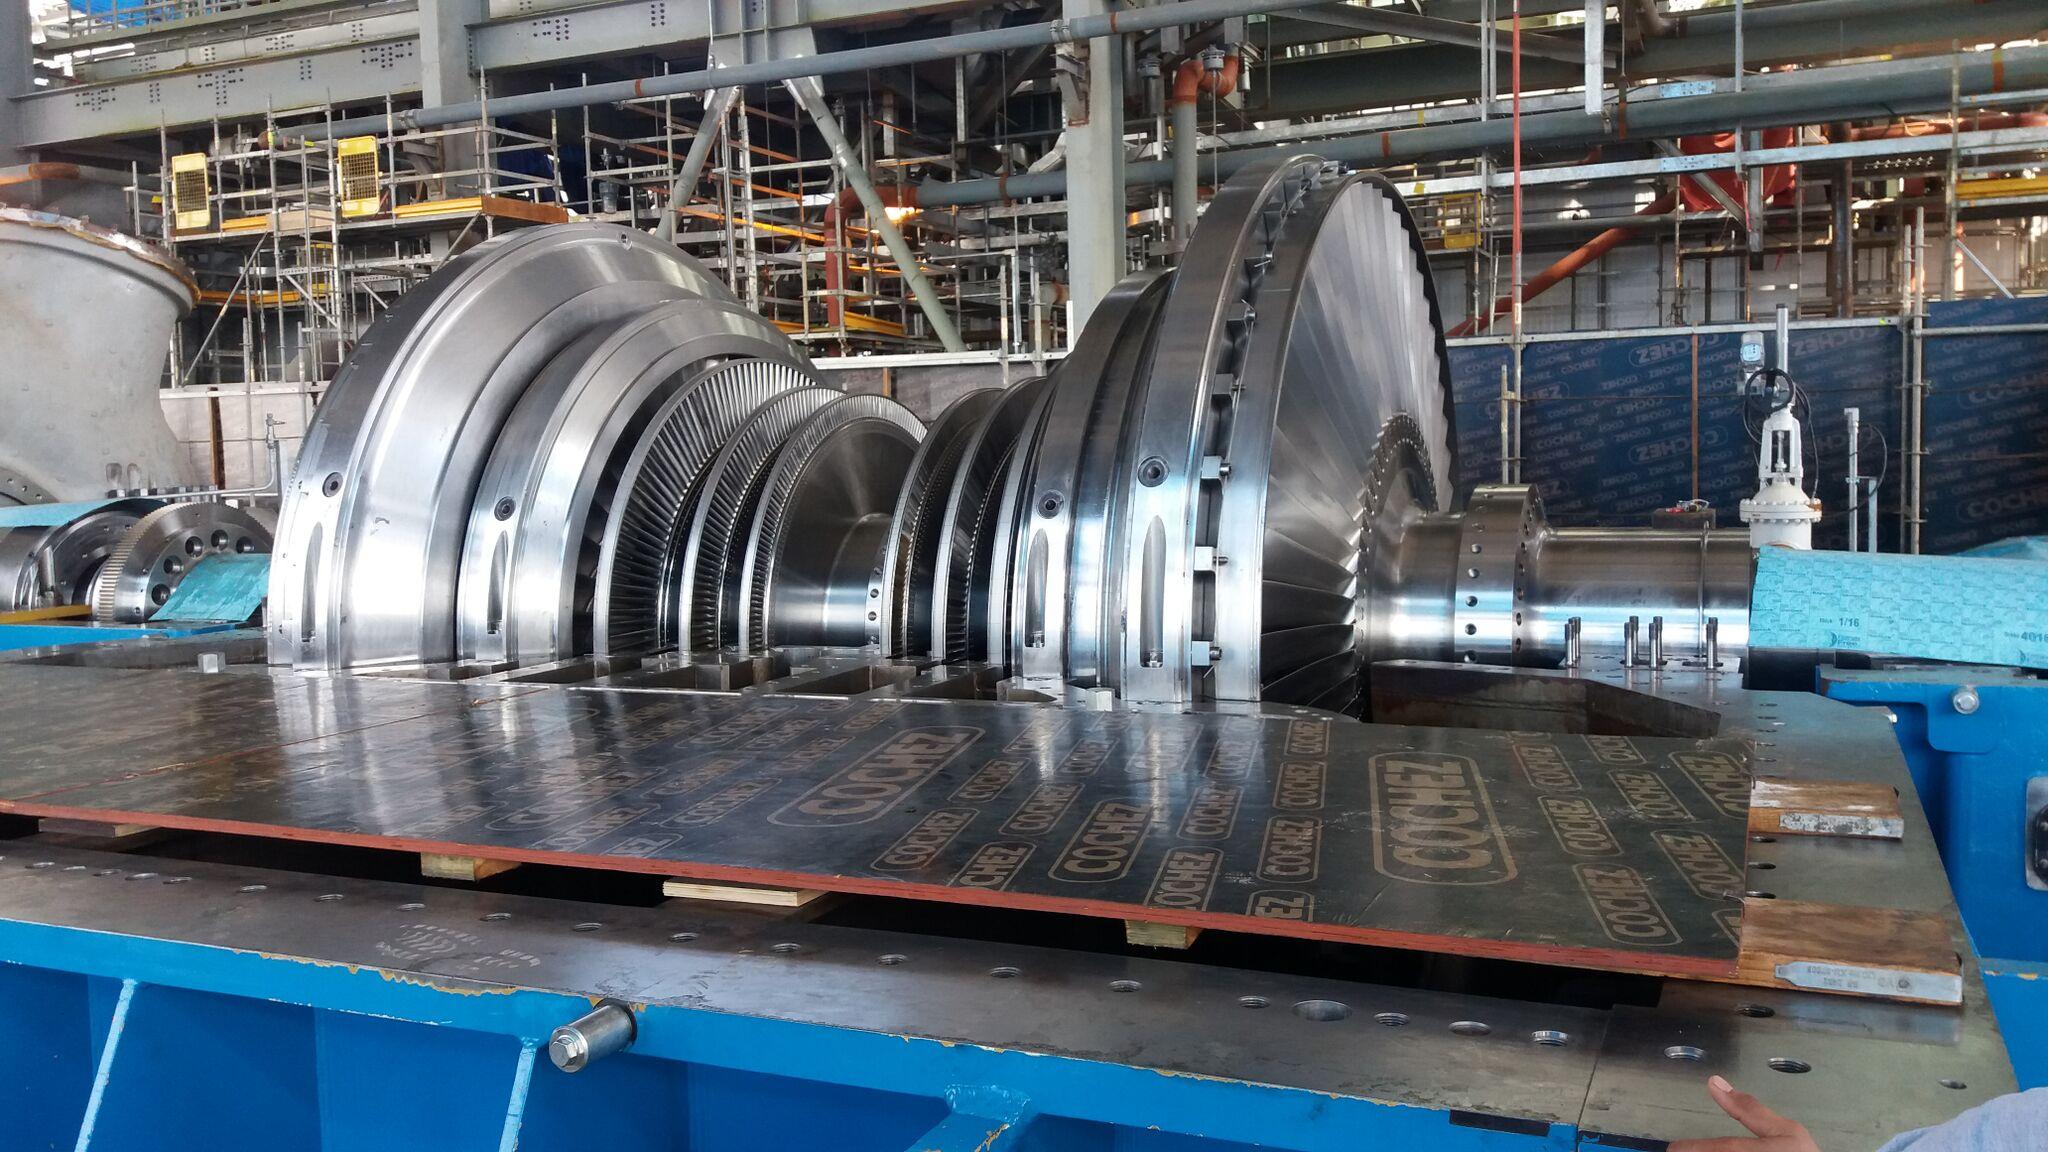 New installation of LP turbine